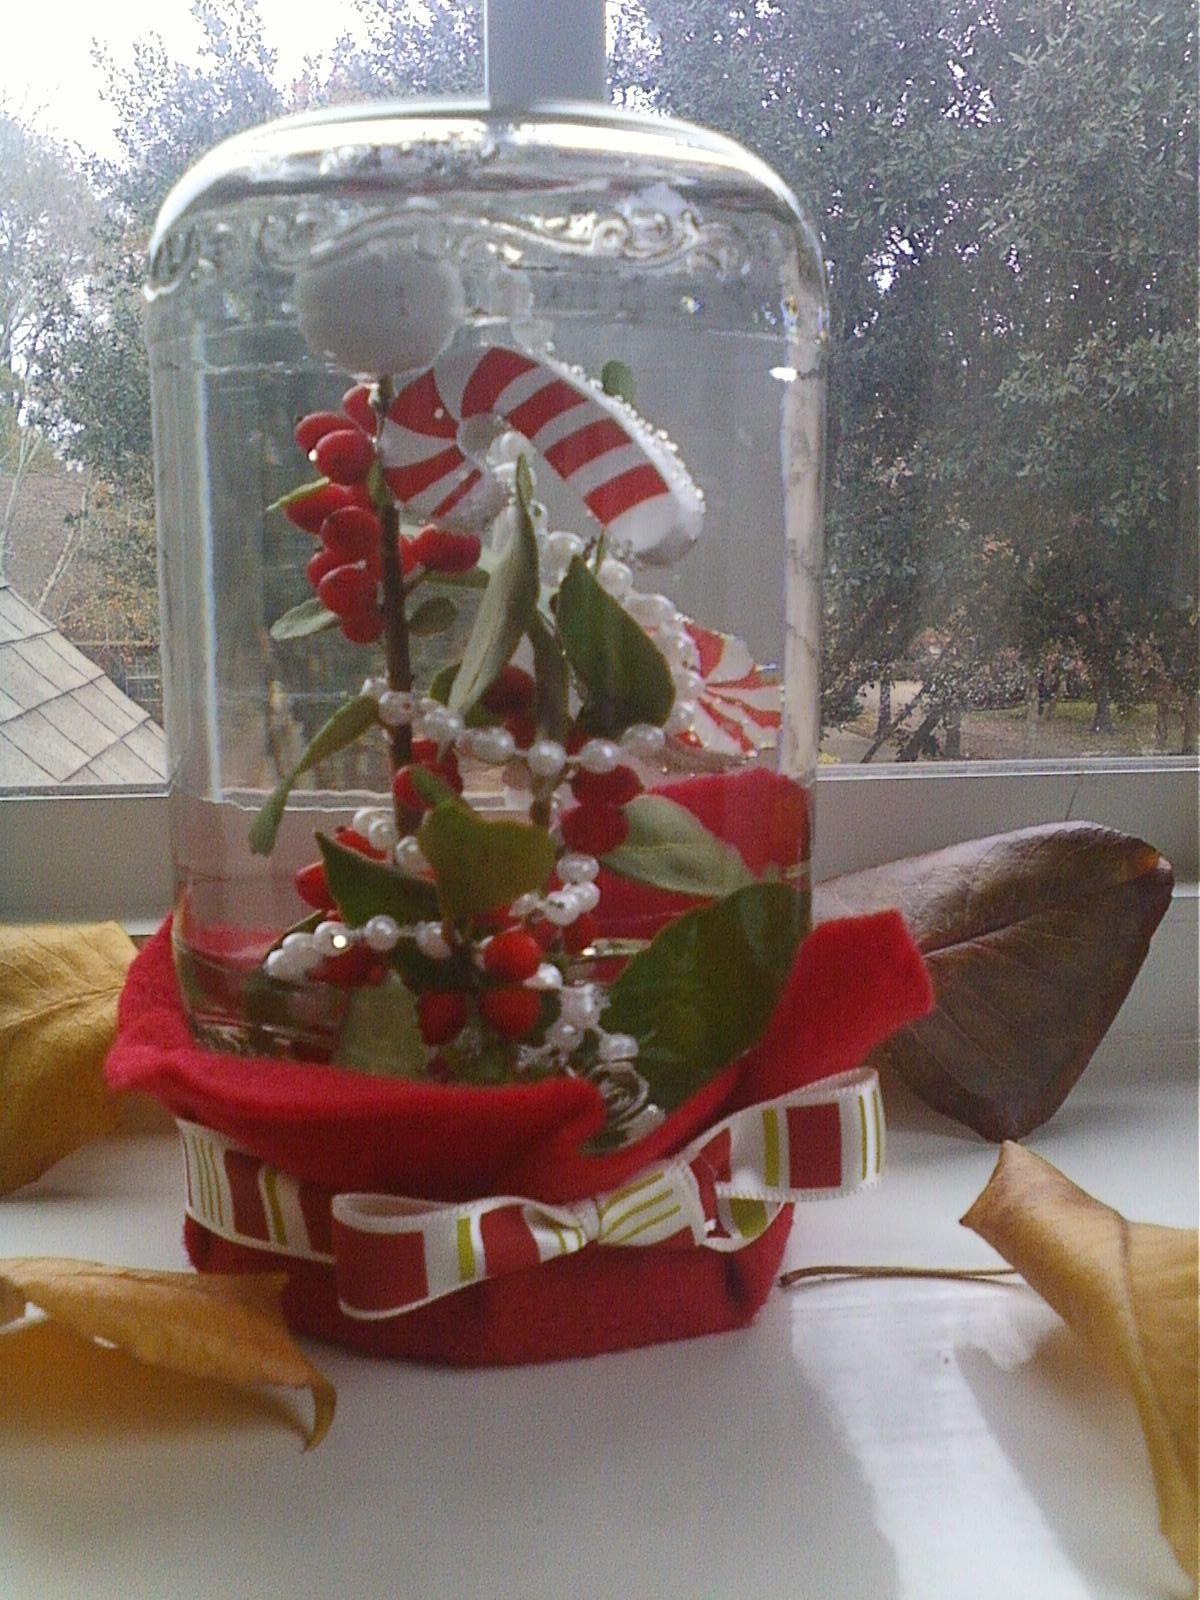 homemade snowglobe ) Christmas snow globes diy